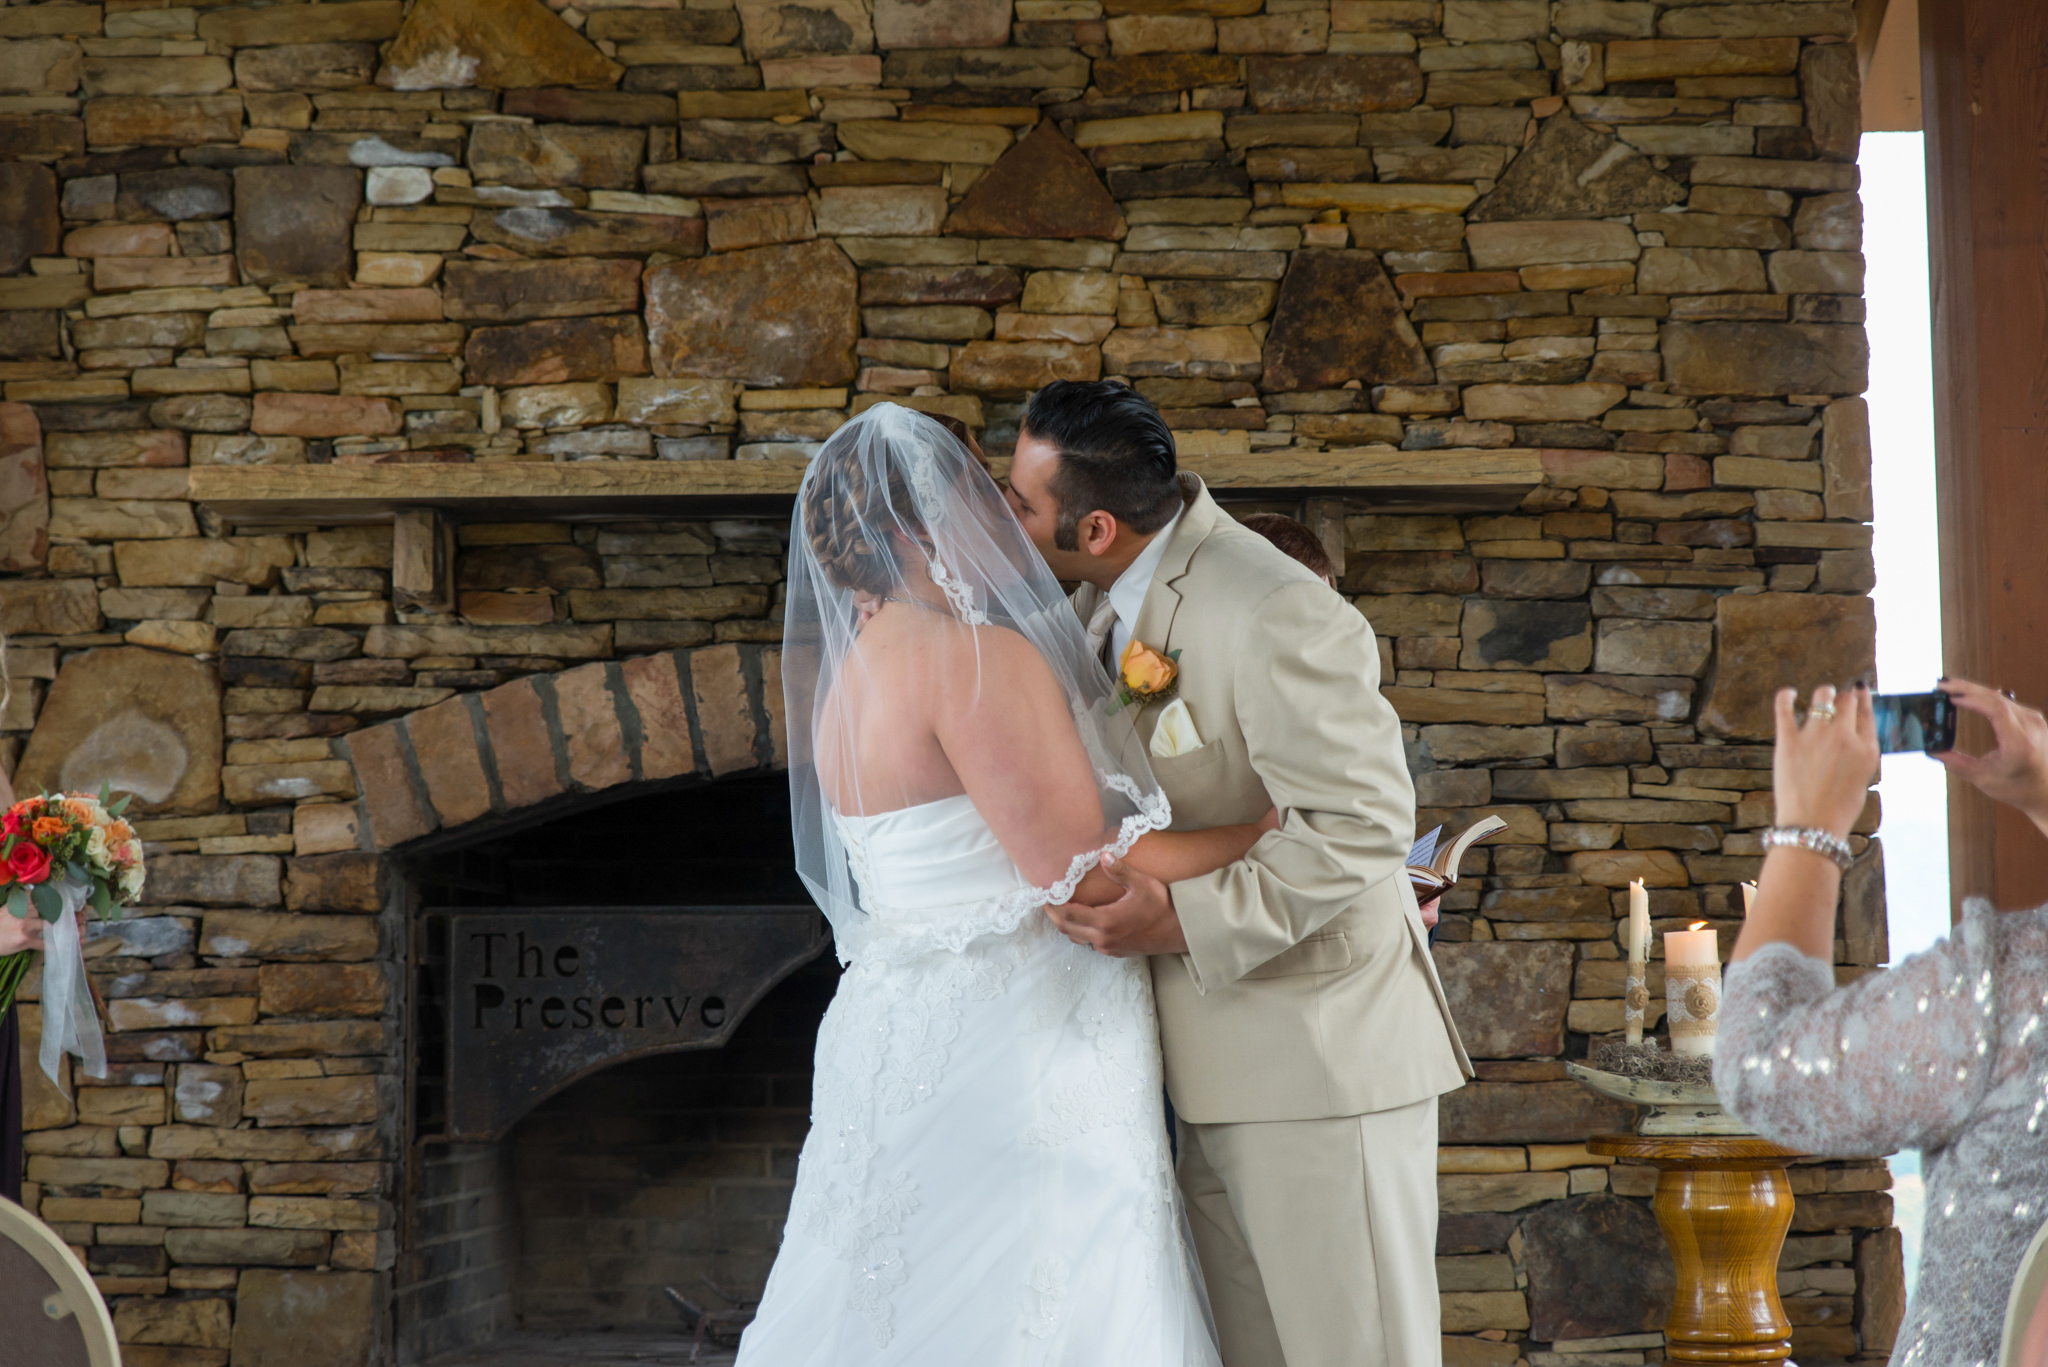 Bride and groom's first kiss at Gatlinburg, TN wedding